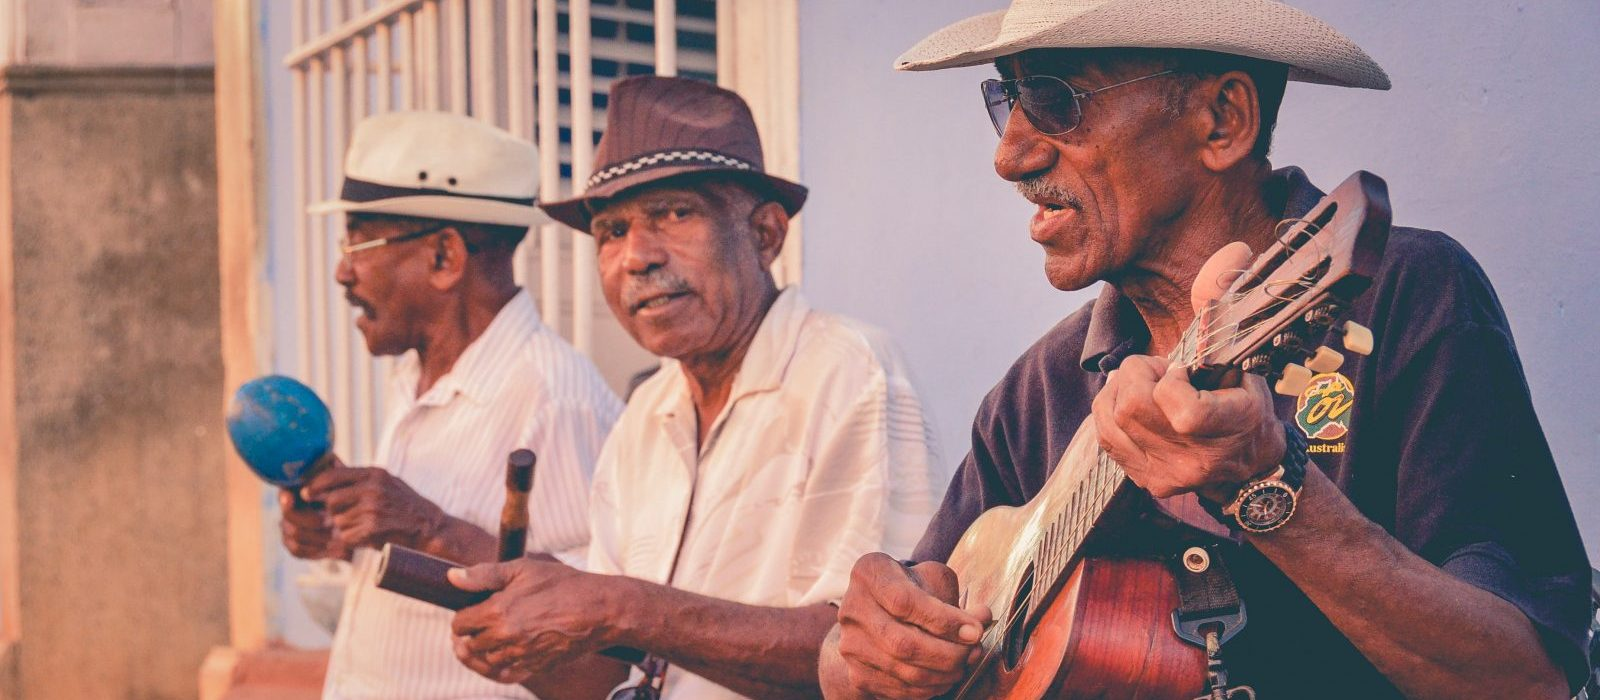 Celebrate Hispanic Heritage All Month Long